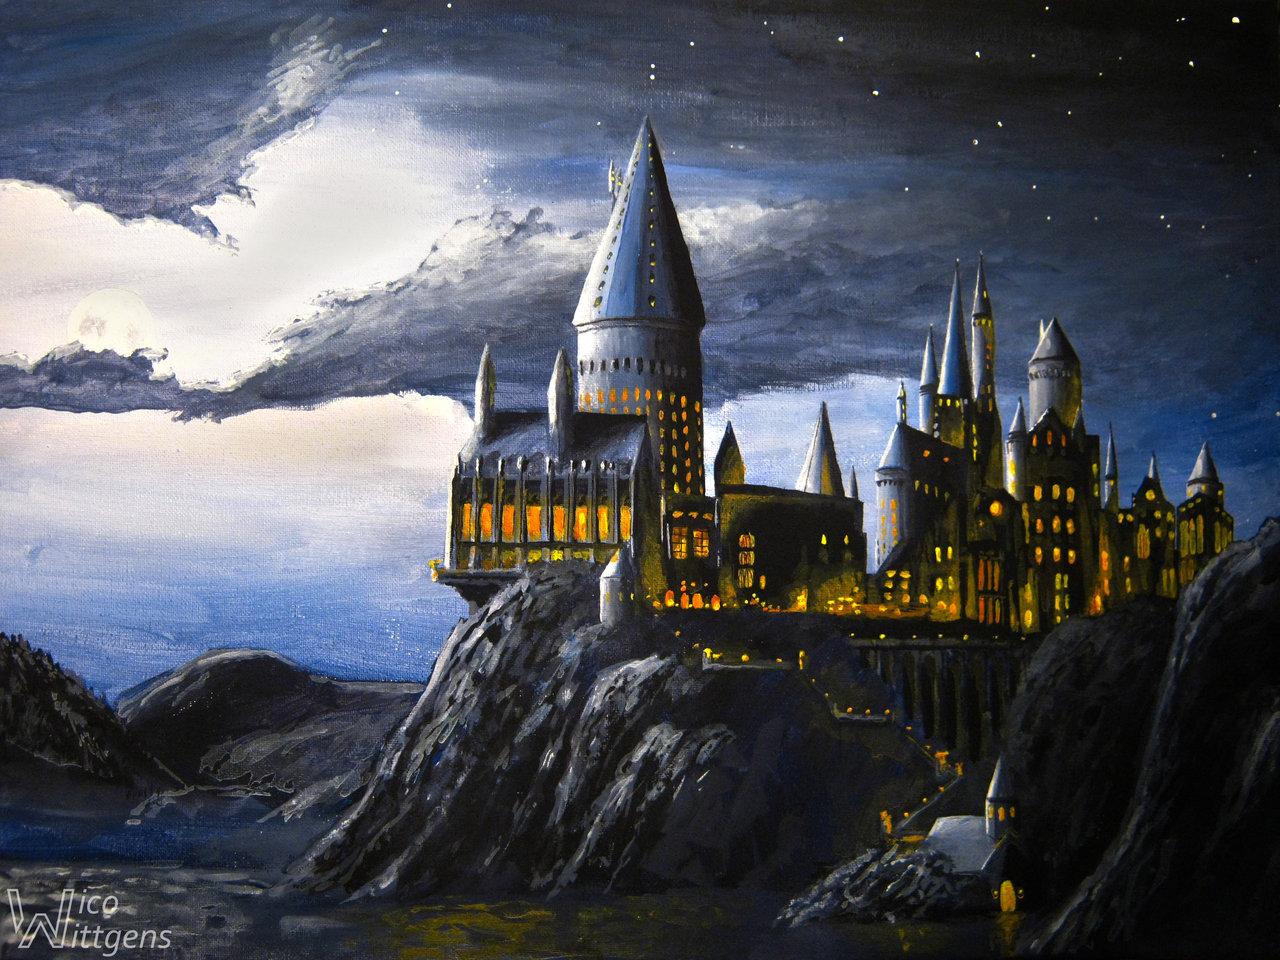 Hogwarts Castle Wallpaper Hogwarts at night by nicow92 1280x960